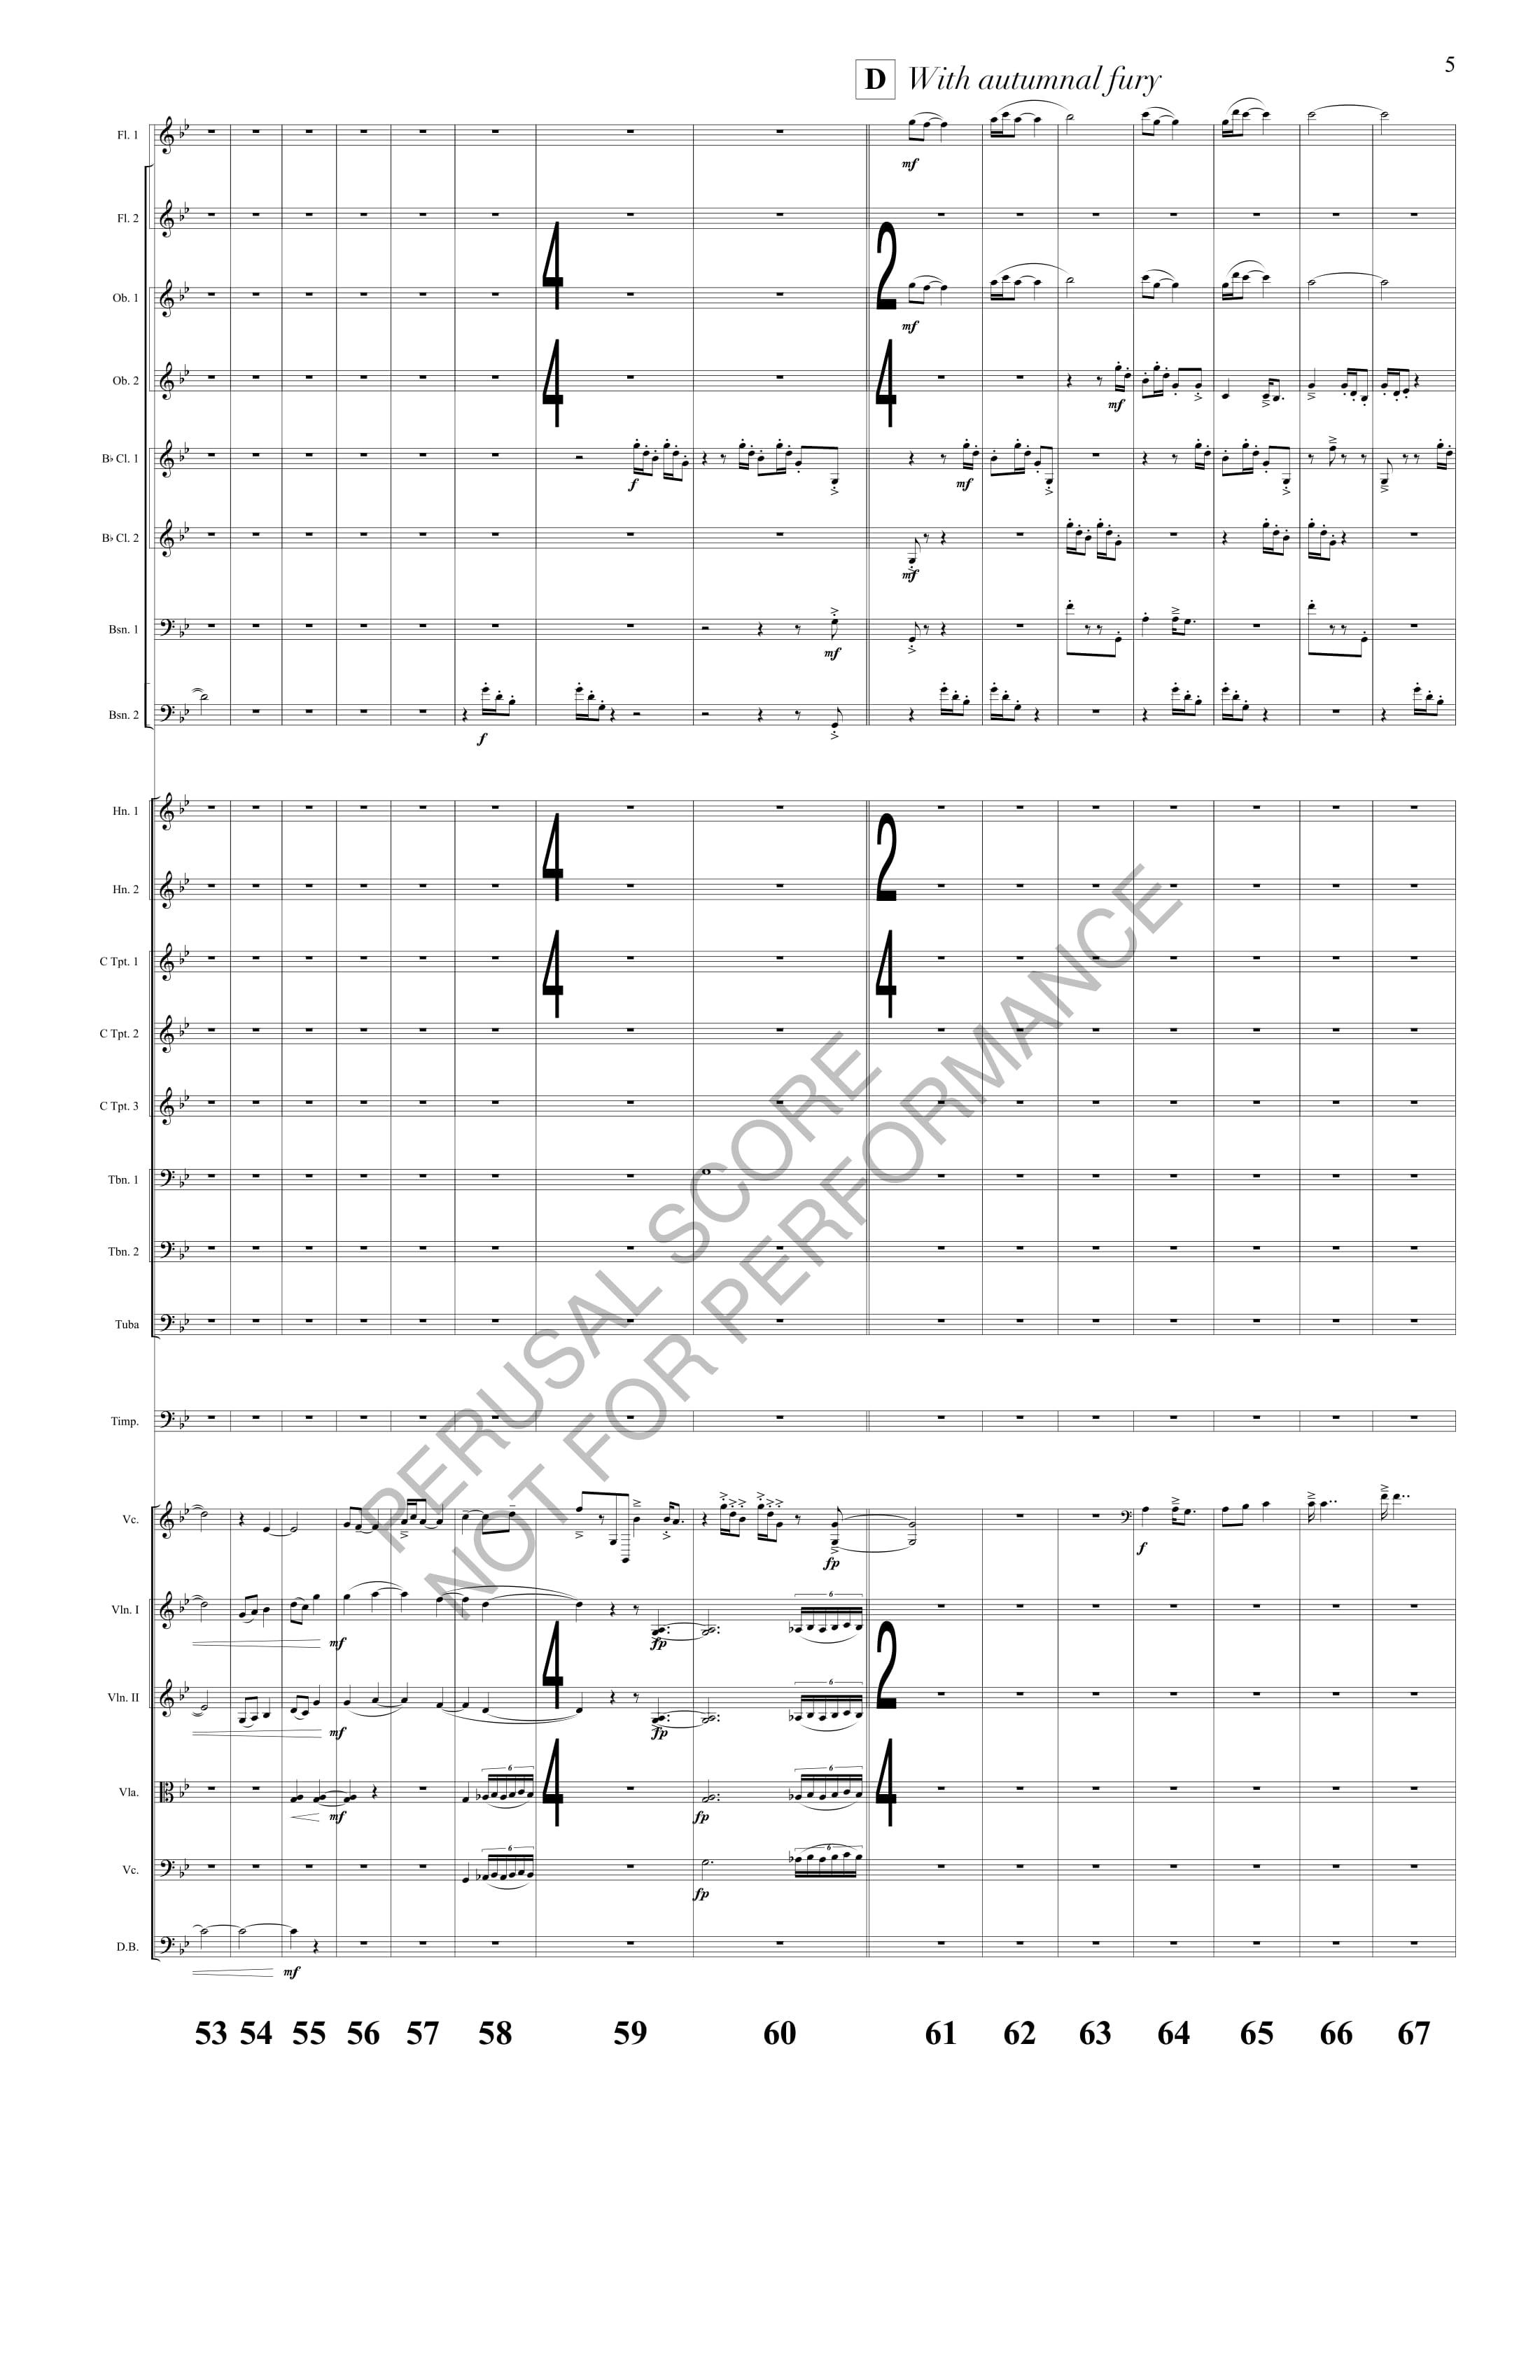 Boyd Tekton Score-watermark-11.jpg